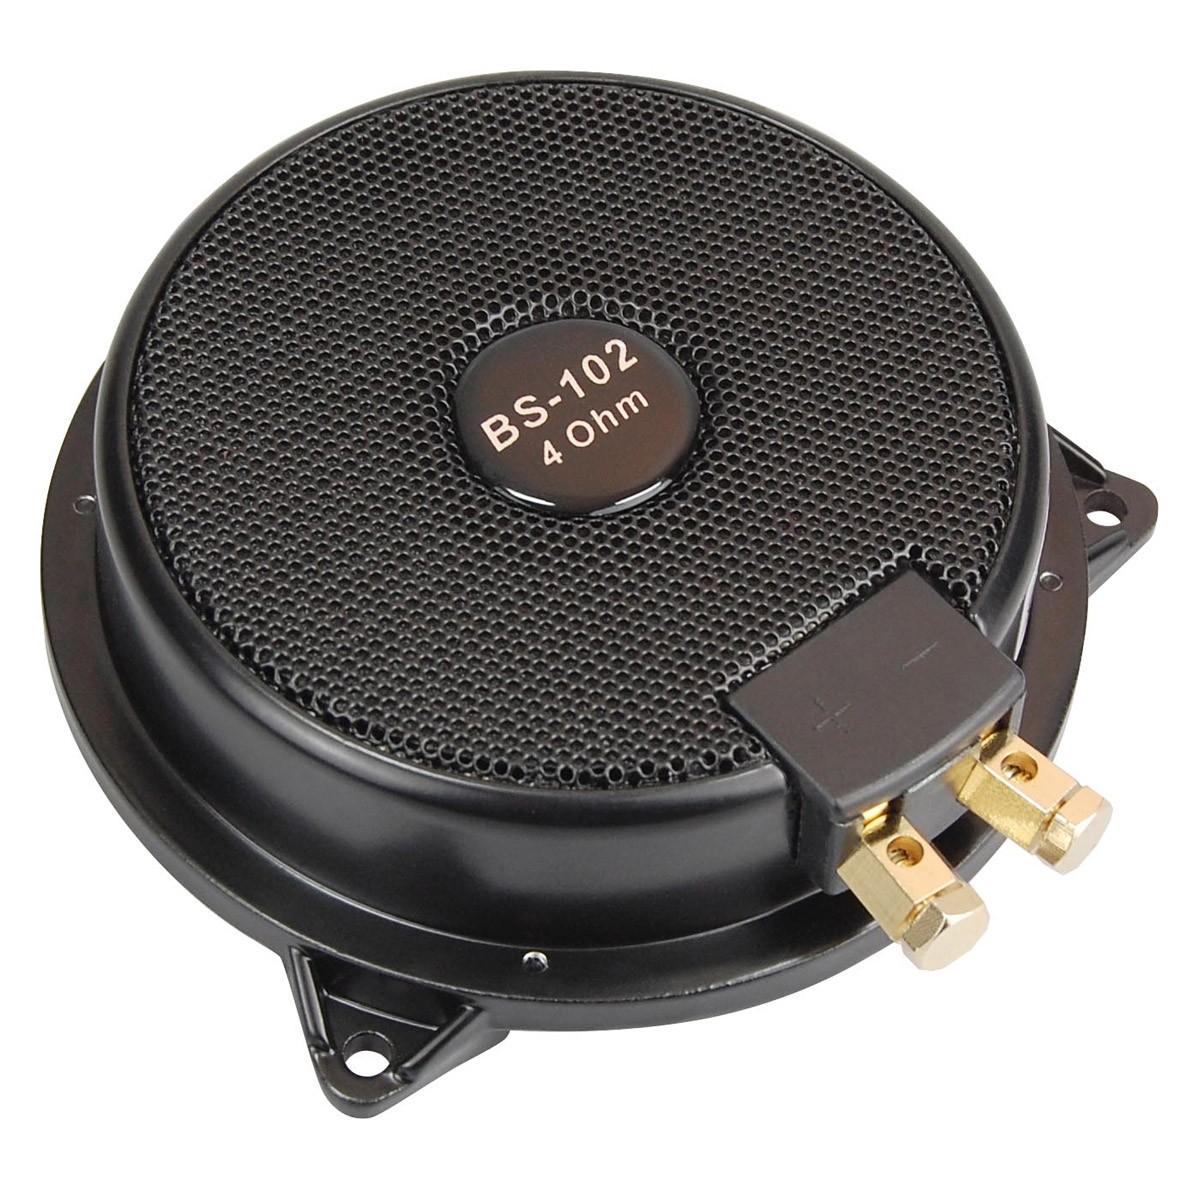 ROCKWOOD BS-102 Speaker Driver Exciter Bodyshaker 50W 4 Ohm 25Hz - 55Hz Ø13cm